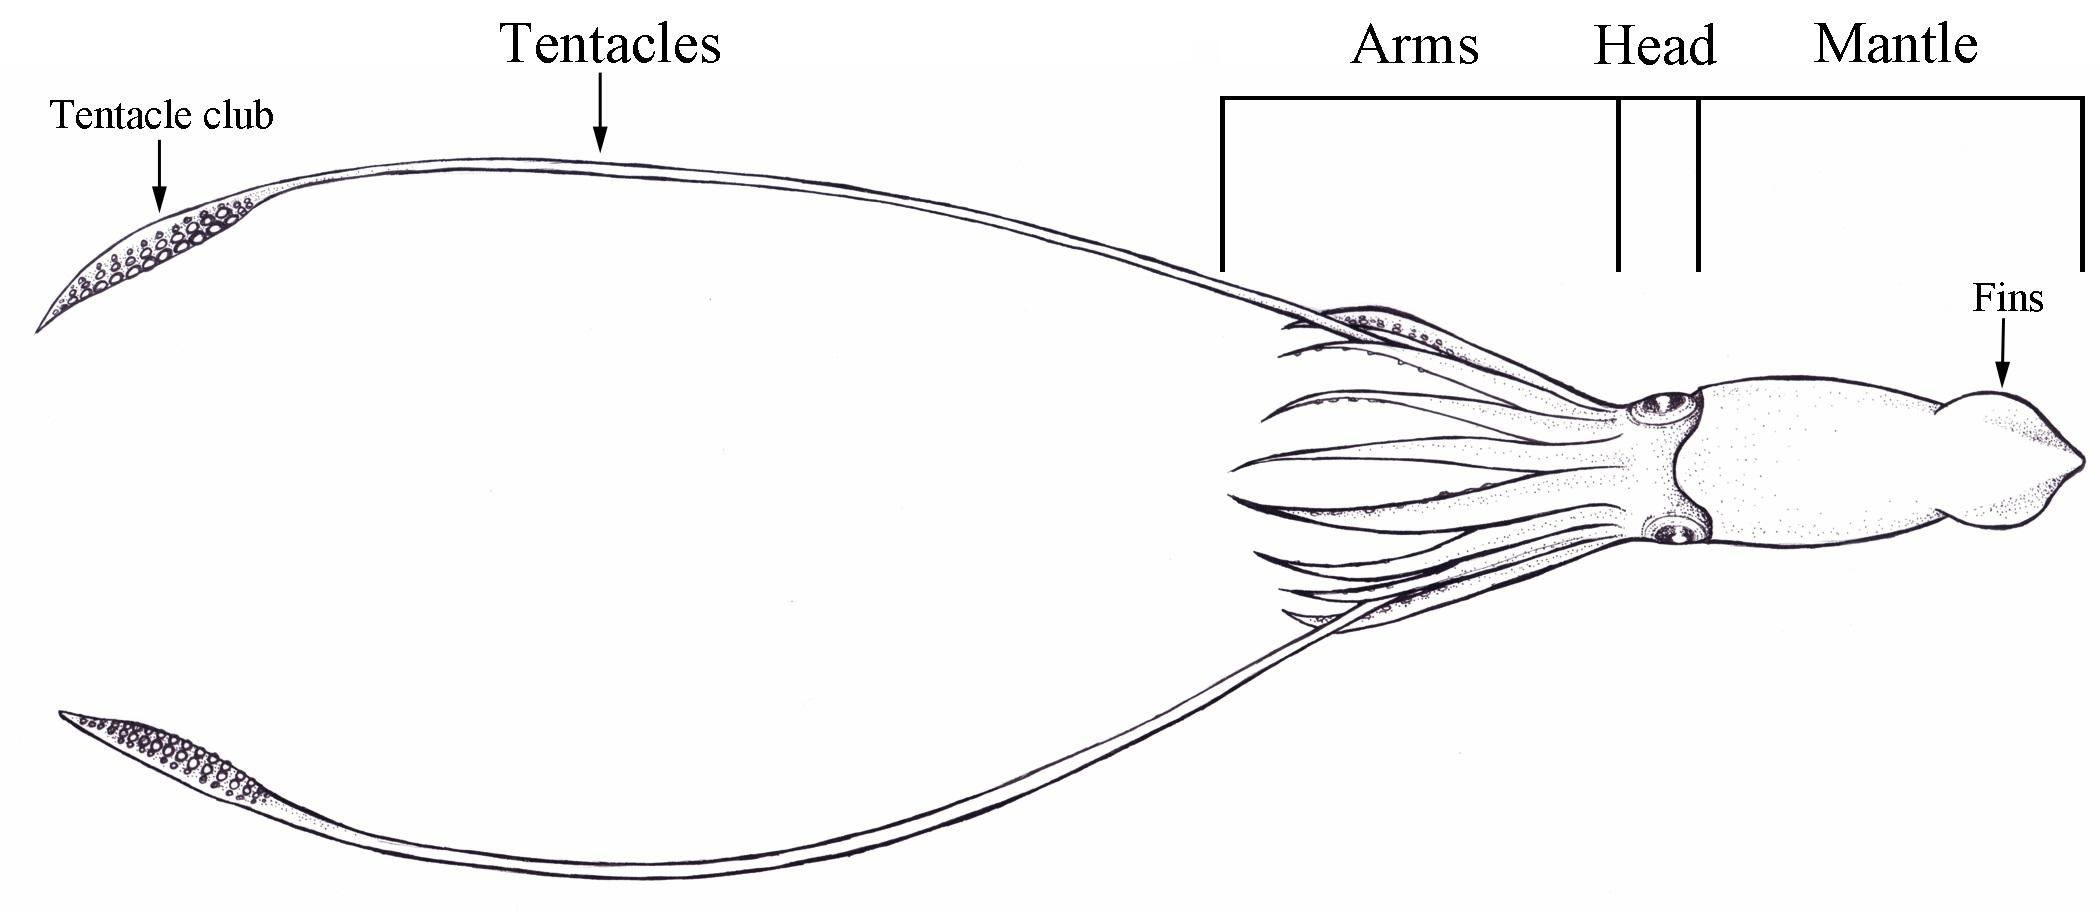 One squid to rule them all | Journal of Geek Studies